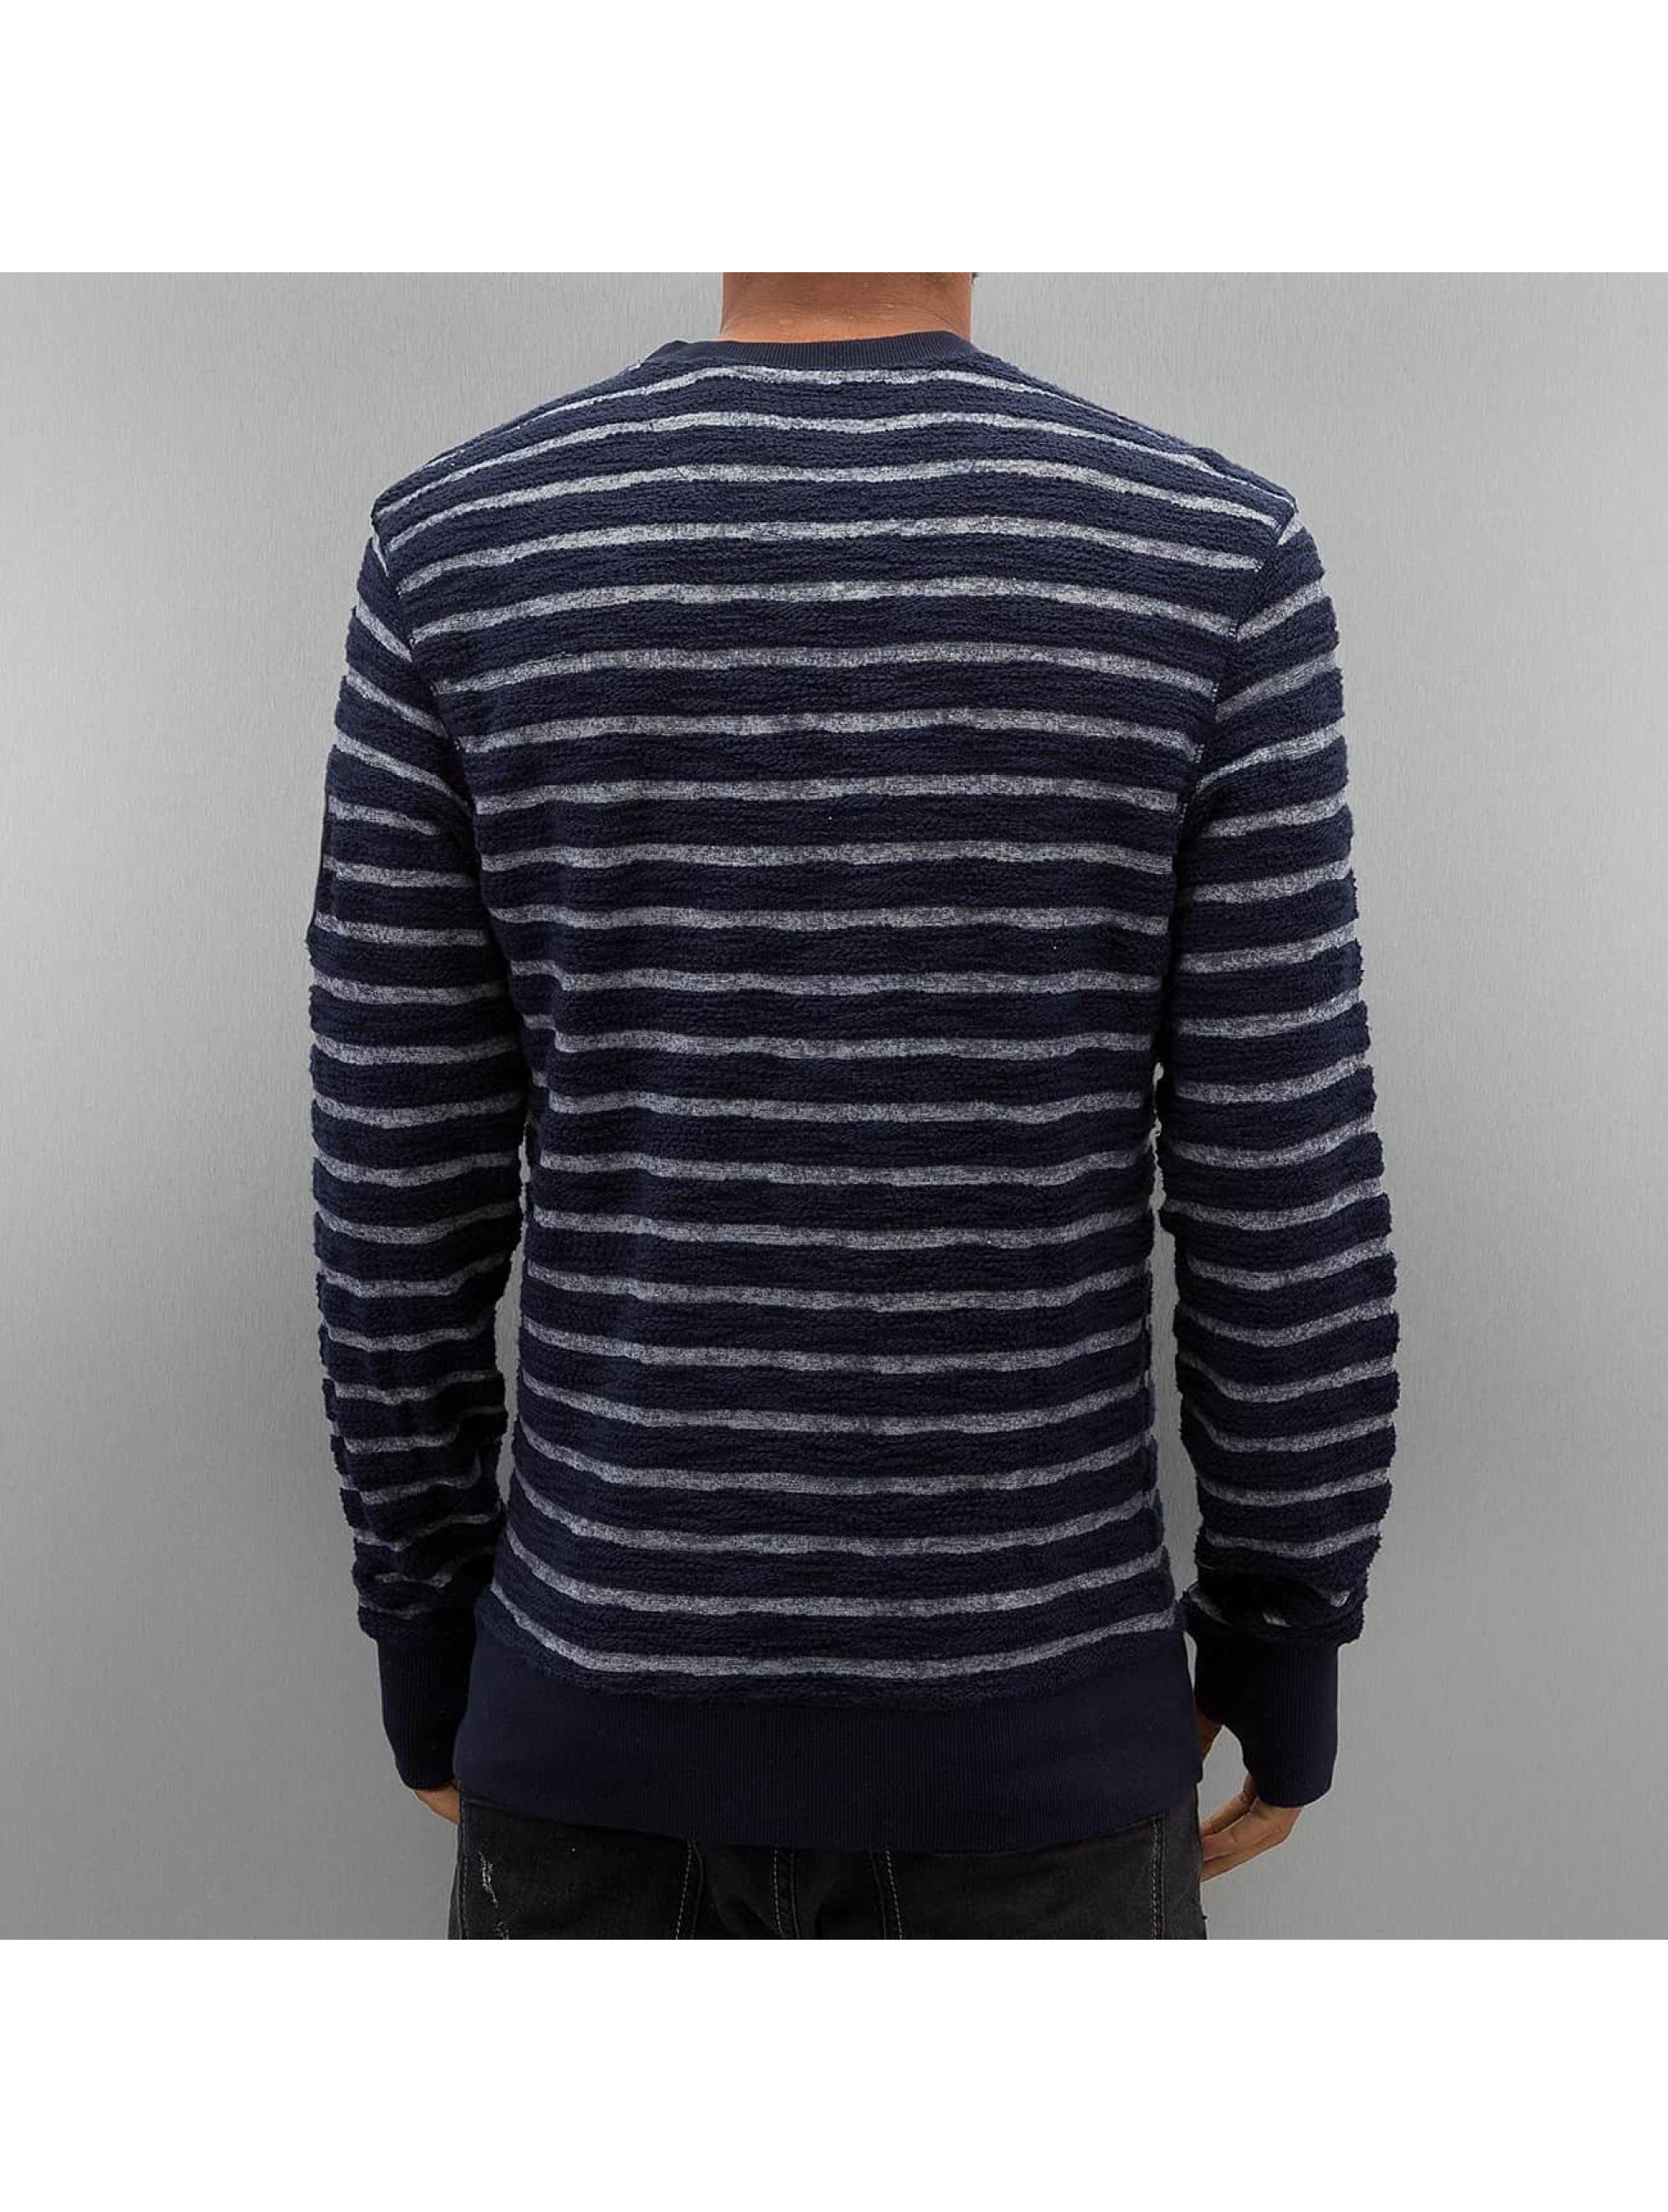 Petrol Industries Swetry Stripes niebieski